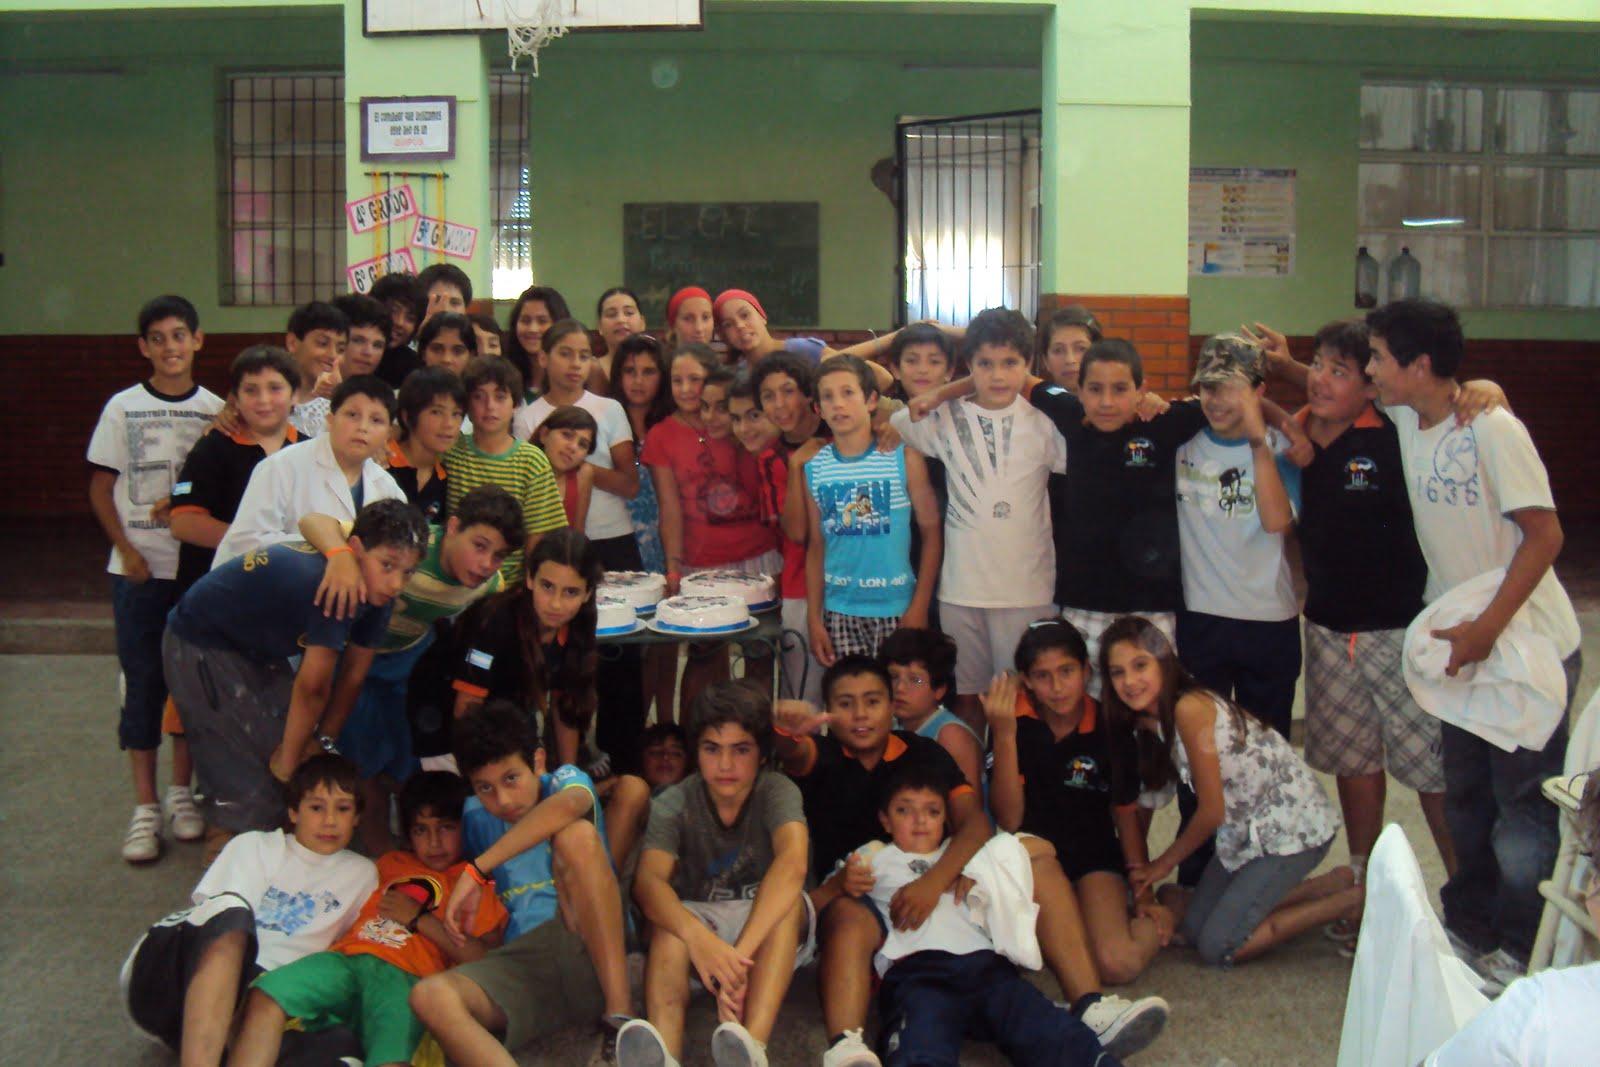 SERRANO - Pcia. de Córdoba: DESPEDIDA A LOS ALUMNOS DE SEXTO GRADO